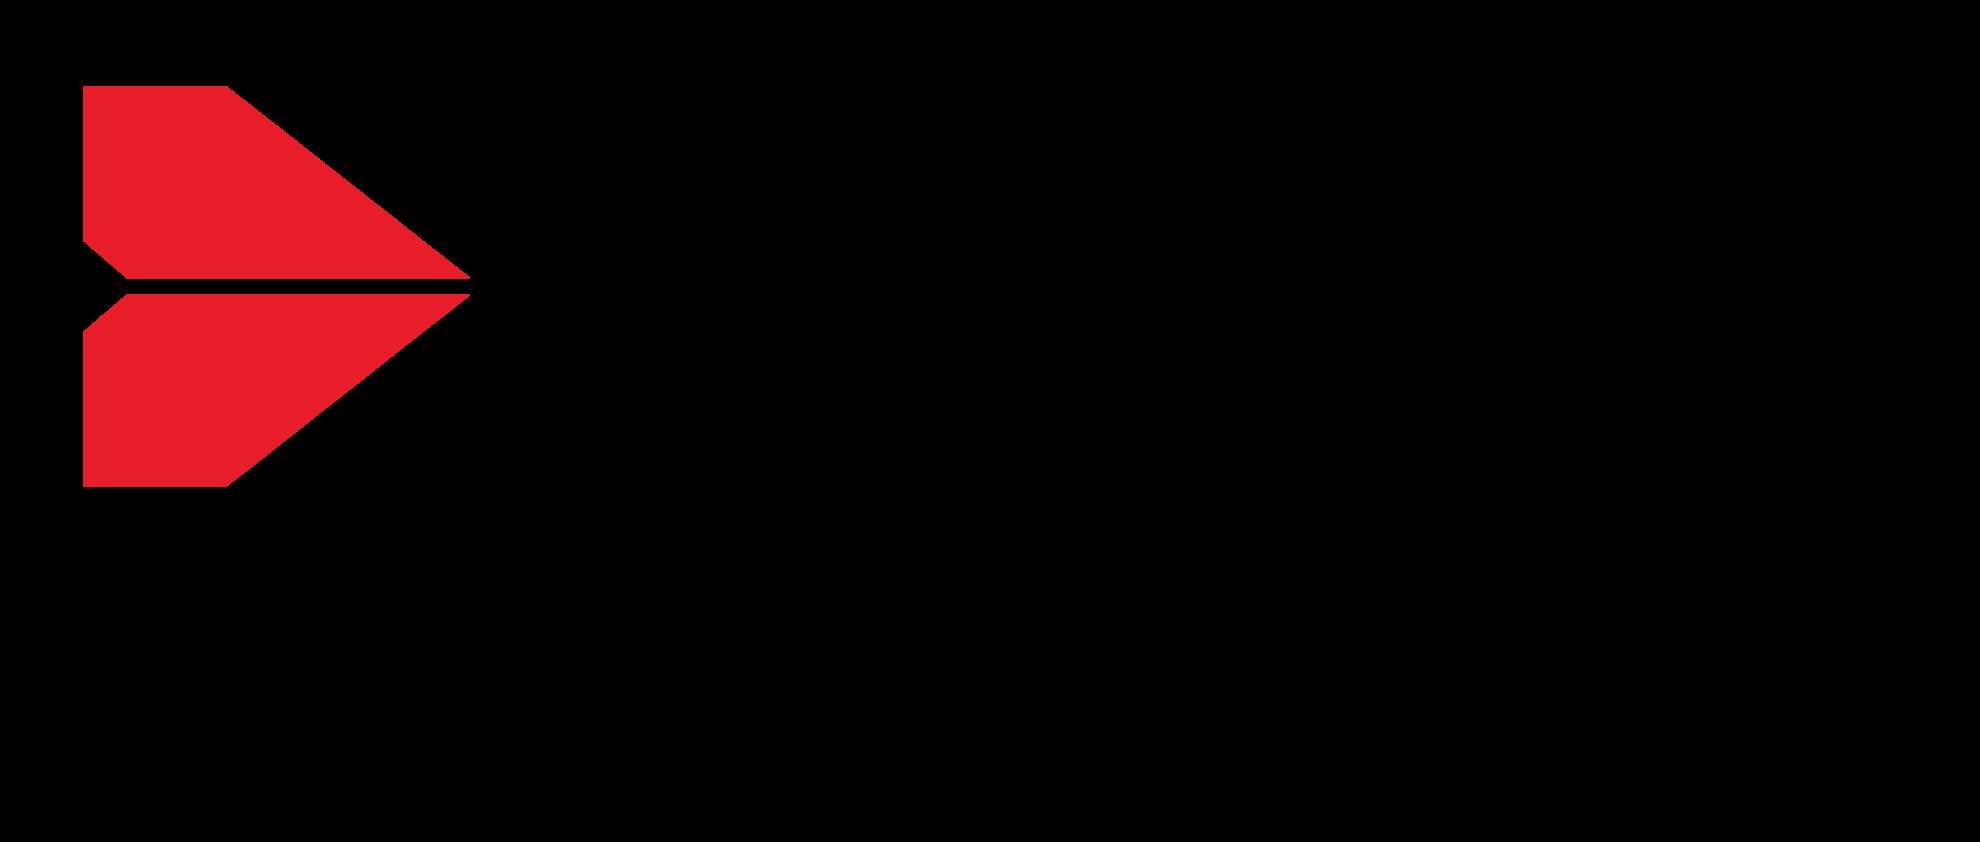 logo IPGS@2x